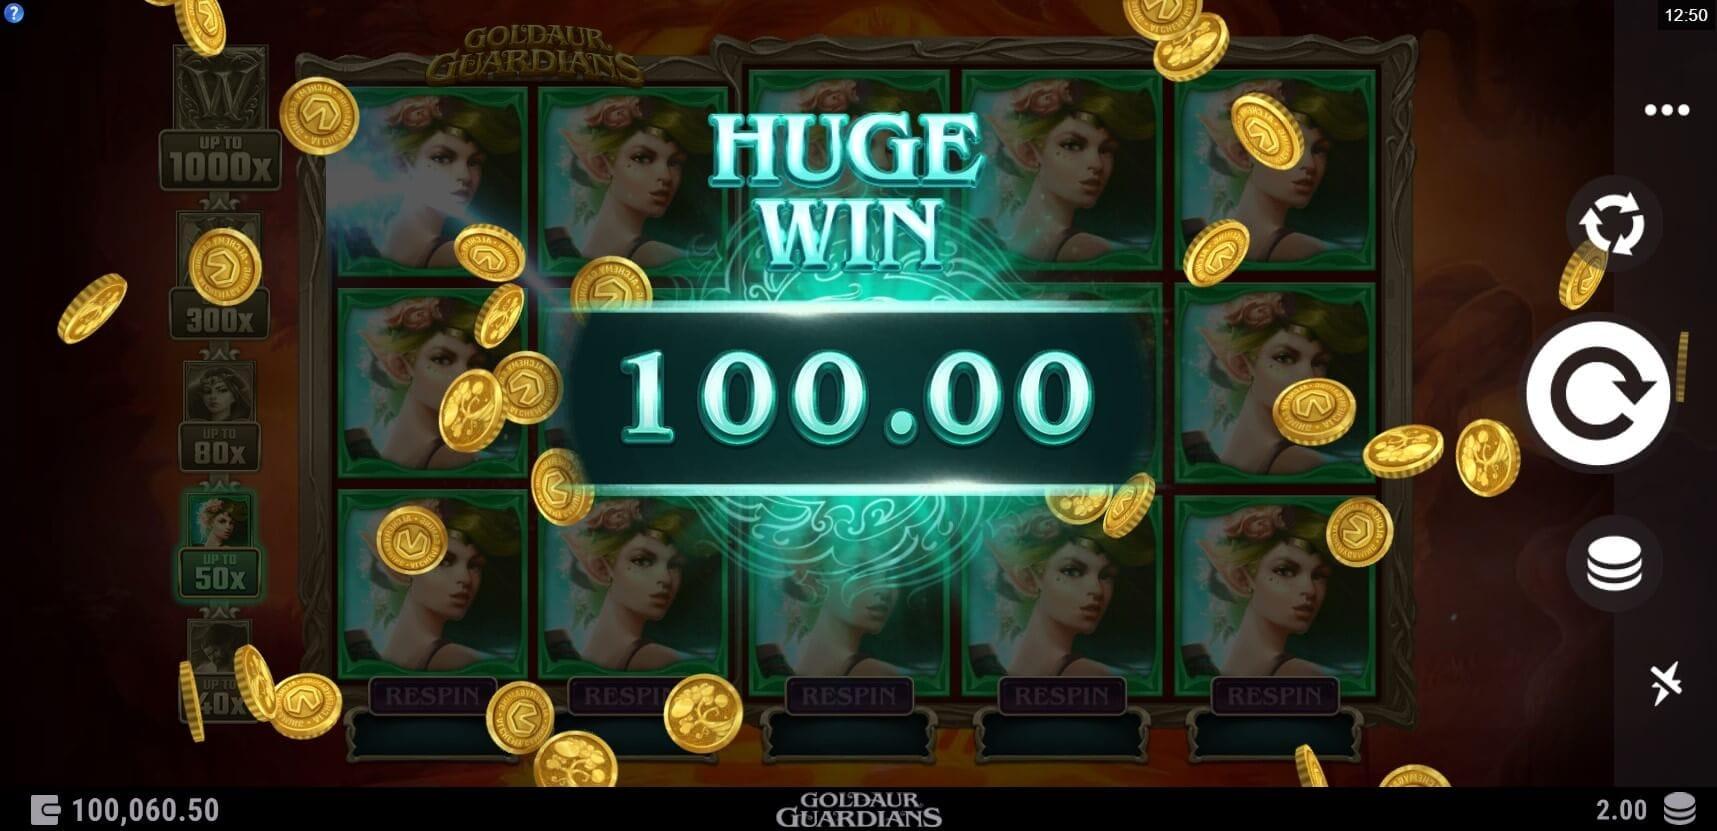 Goldaur Guardians Slots Huge Win